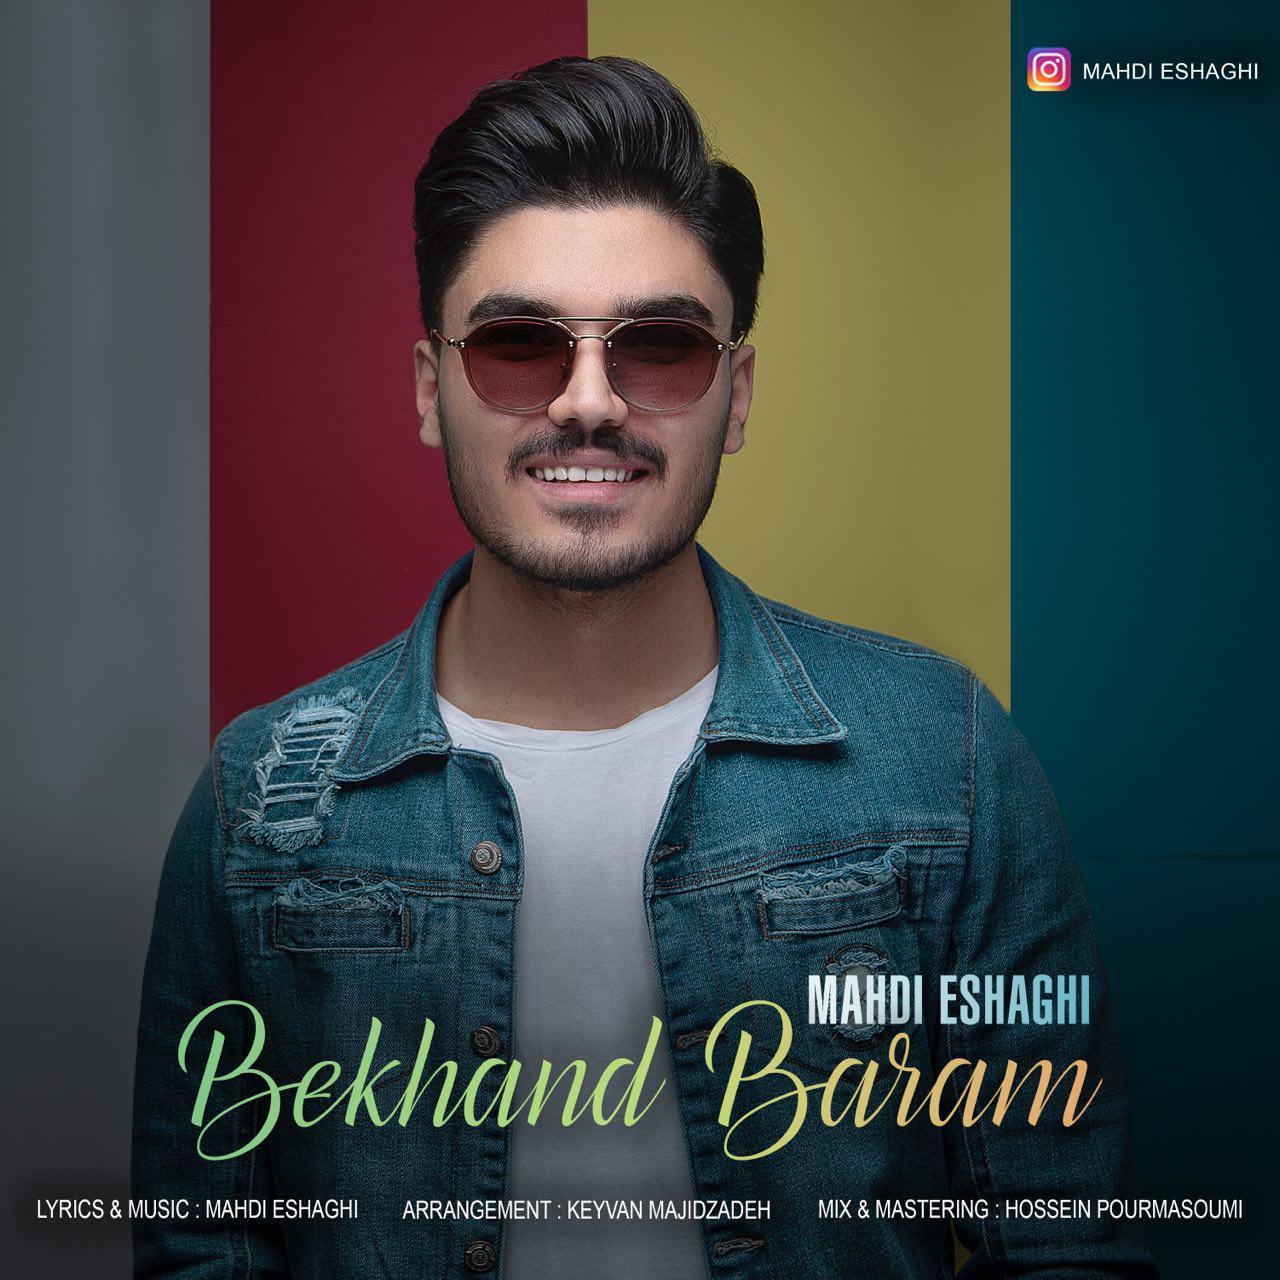 Mahdi Eshaghi – Bekhand Baram